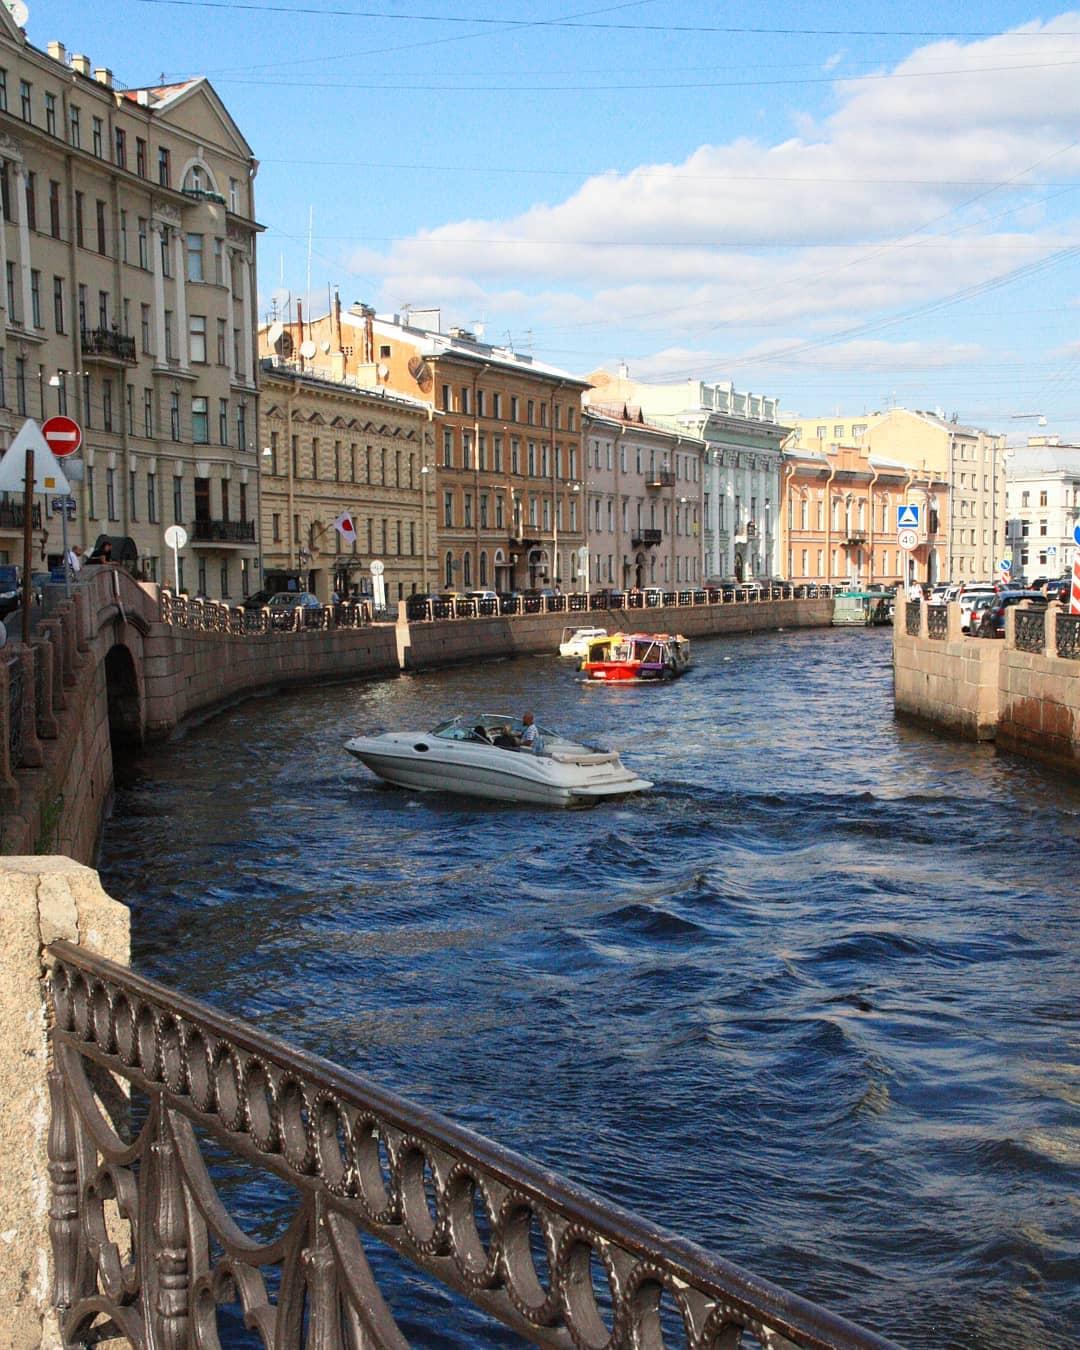 Экскурсии по каналам Санкт-Петербург